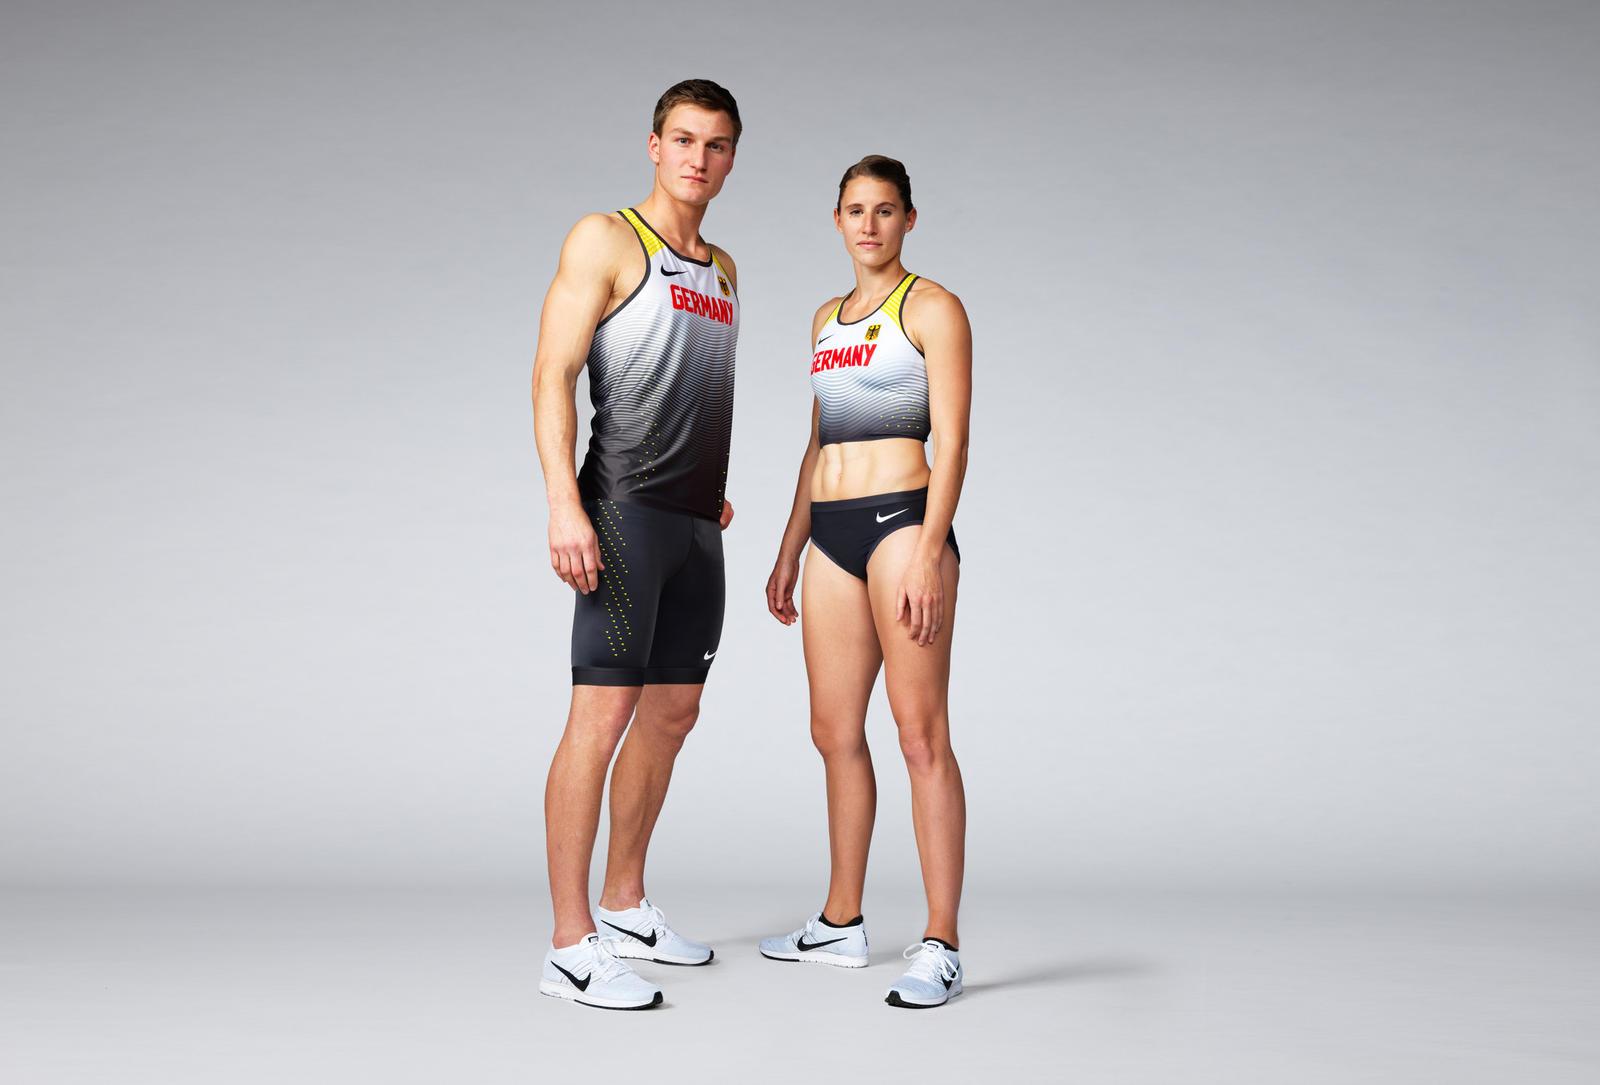 0d75d3fcc1432 Thomas Röhler and Carolin Schäfer in Germany 2016 Nike Vapor Track & Field  Kits